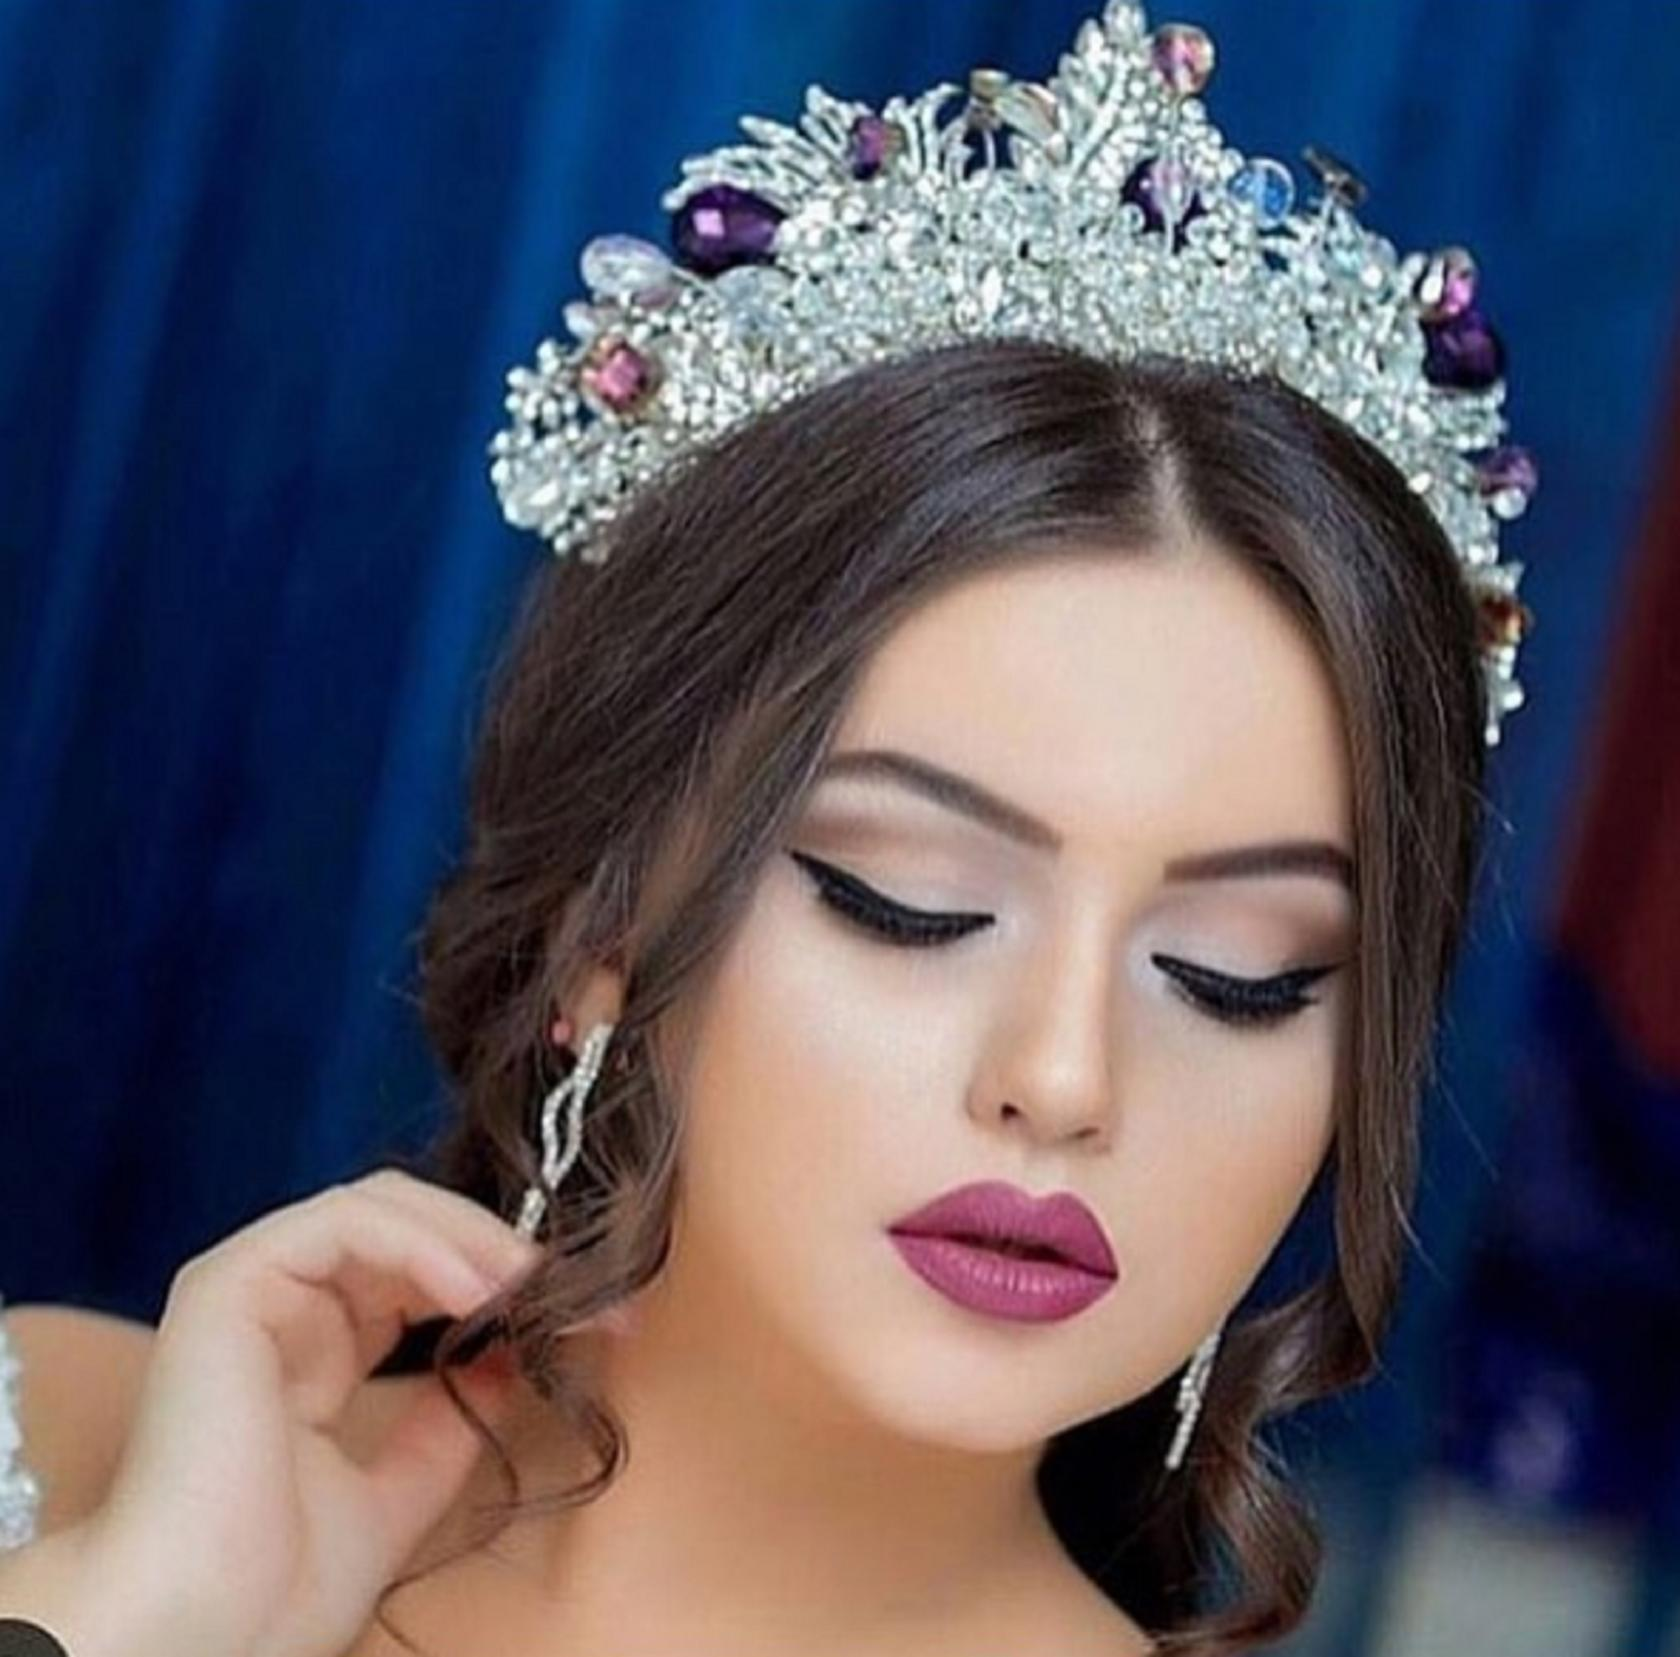 Русскую девушку унизили и опозорили фото 281-852